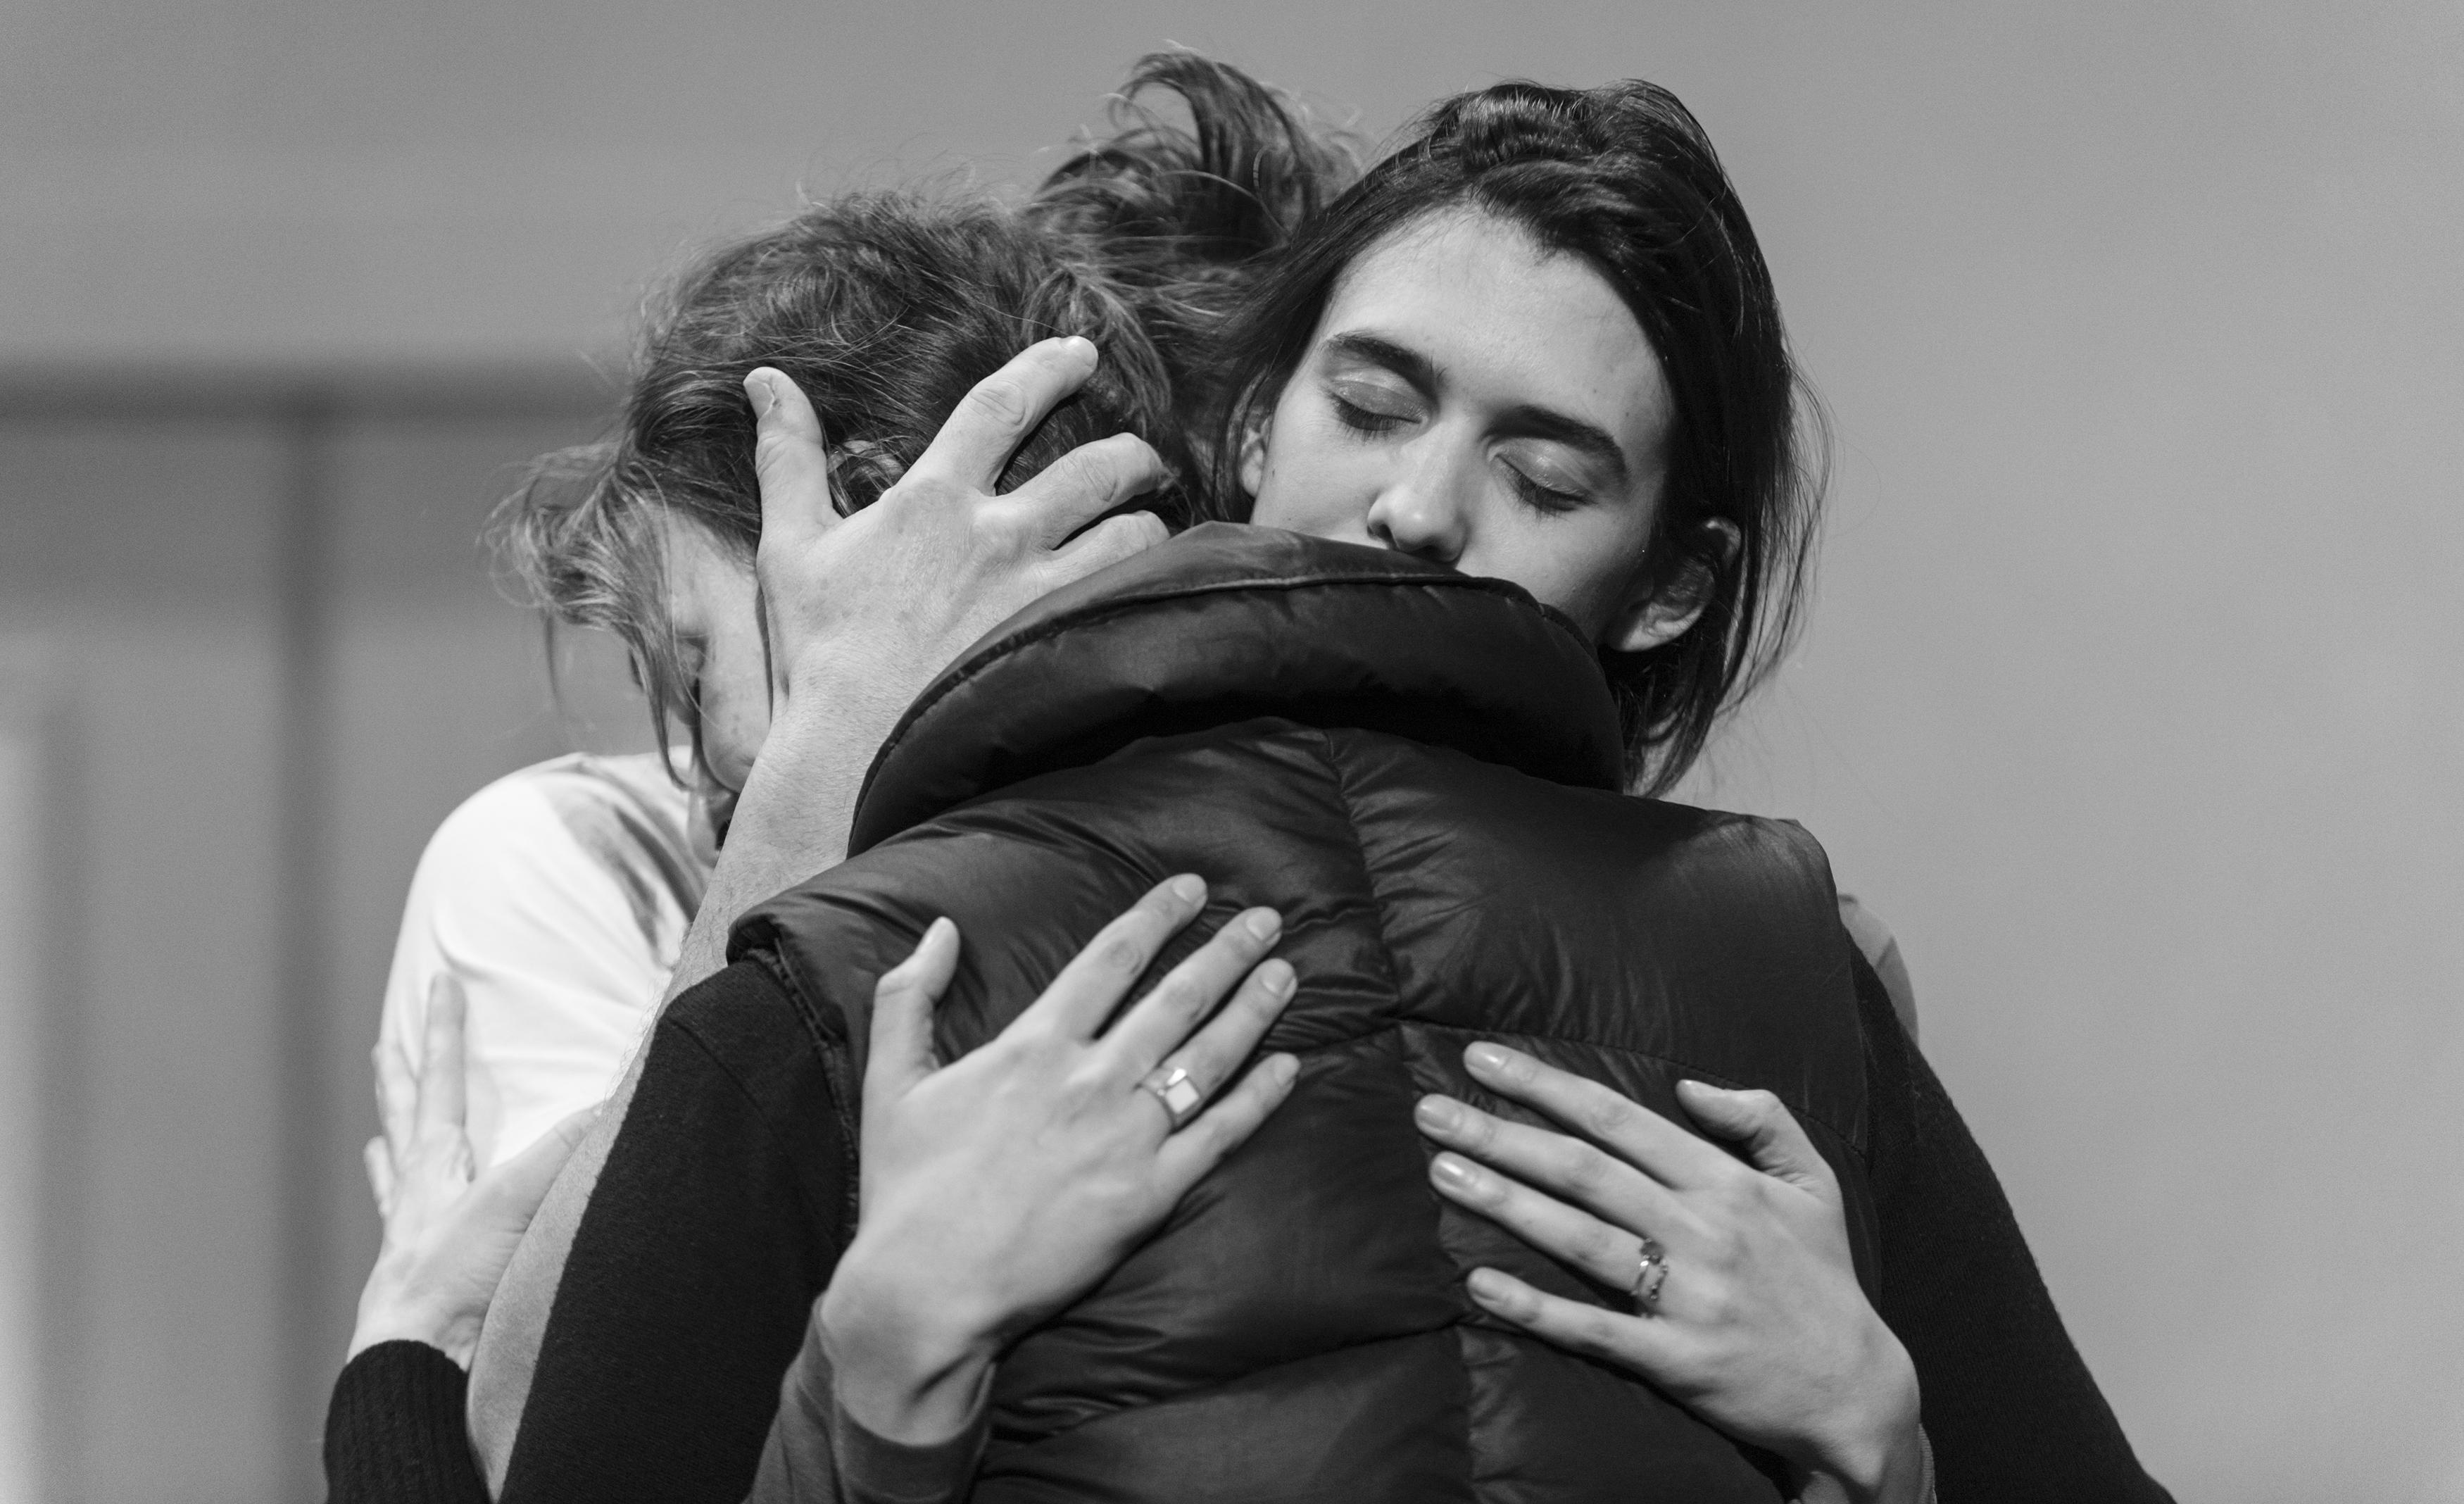 Christophe Grégoire, Camille Cayol and Valentine Catzéflis